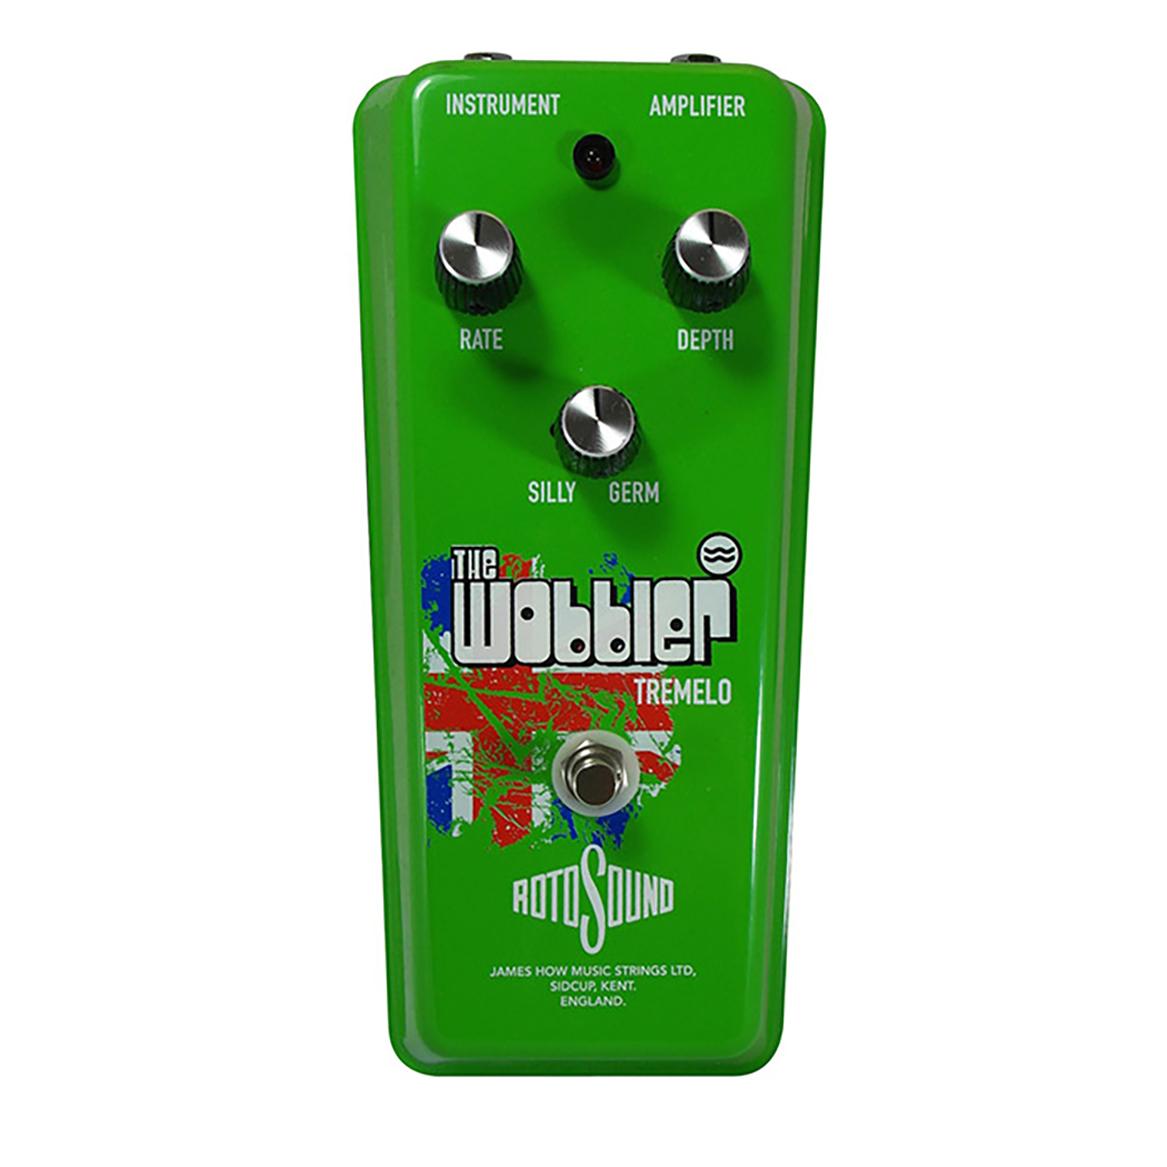 Rotosound Wobbler Tremelo effects pedal. Germanium tremolo